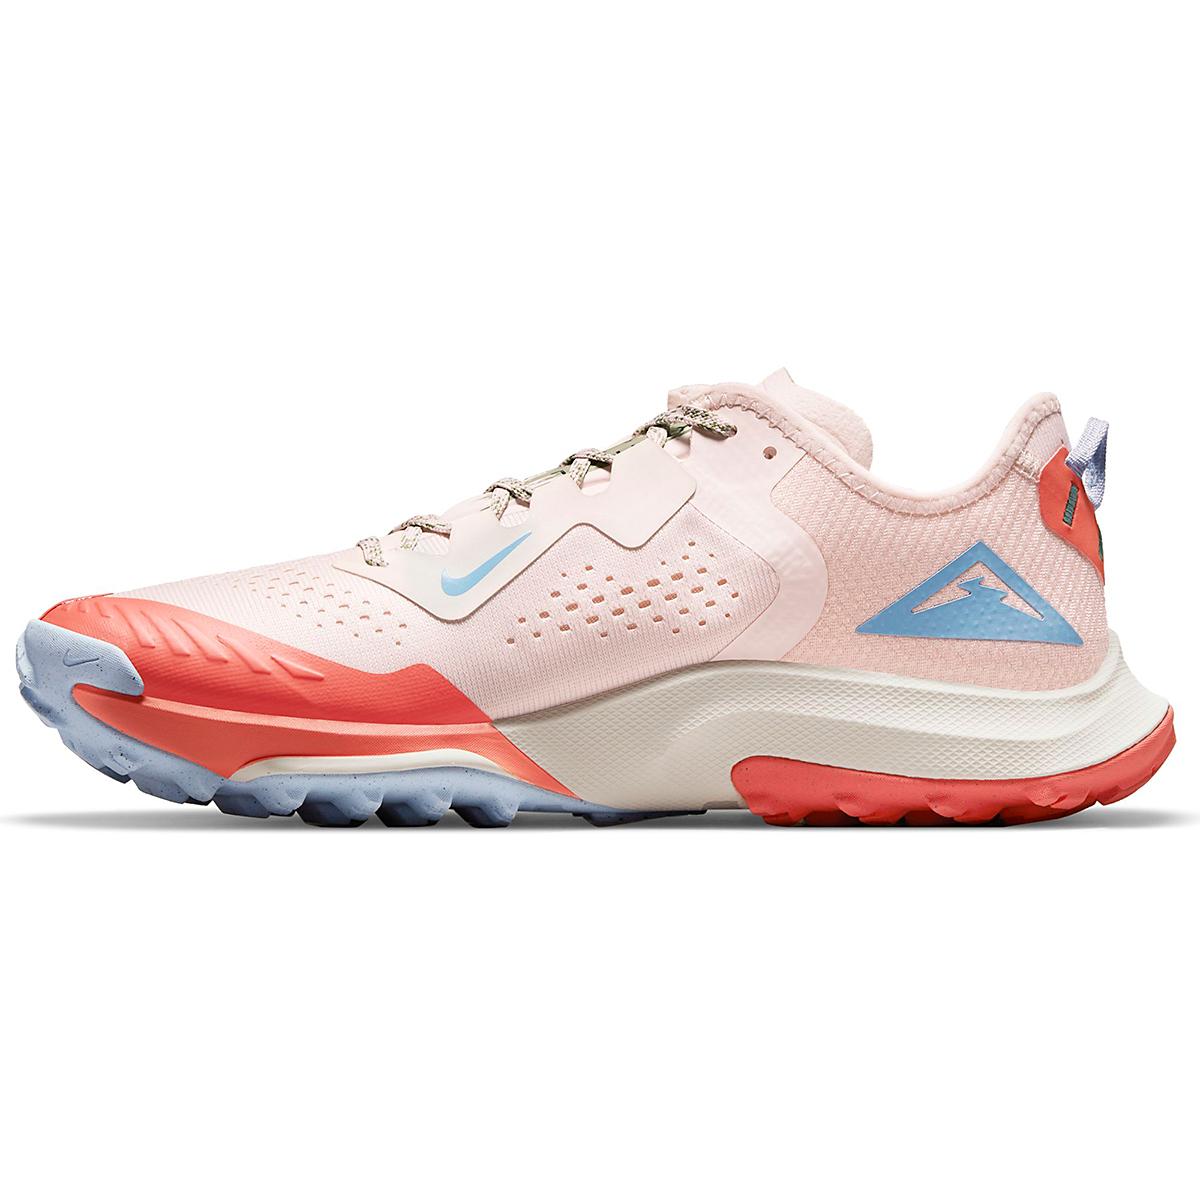 Women's Nike Air Zoom Terra Kiger 7 Trail Running Shoe - Color: Light Soft Pink/Bicoastal/Magic Ember - Size: 5 - Width: Regular, Light Soft Pink/Bicoastal/Magic Ember, large, image 2